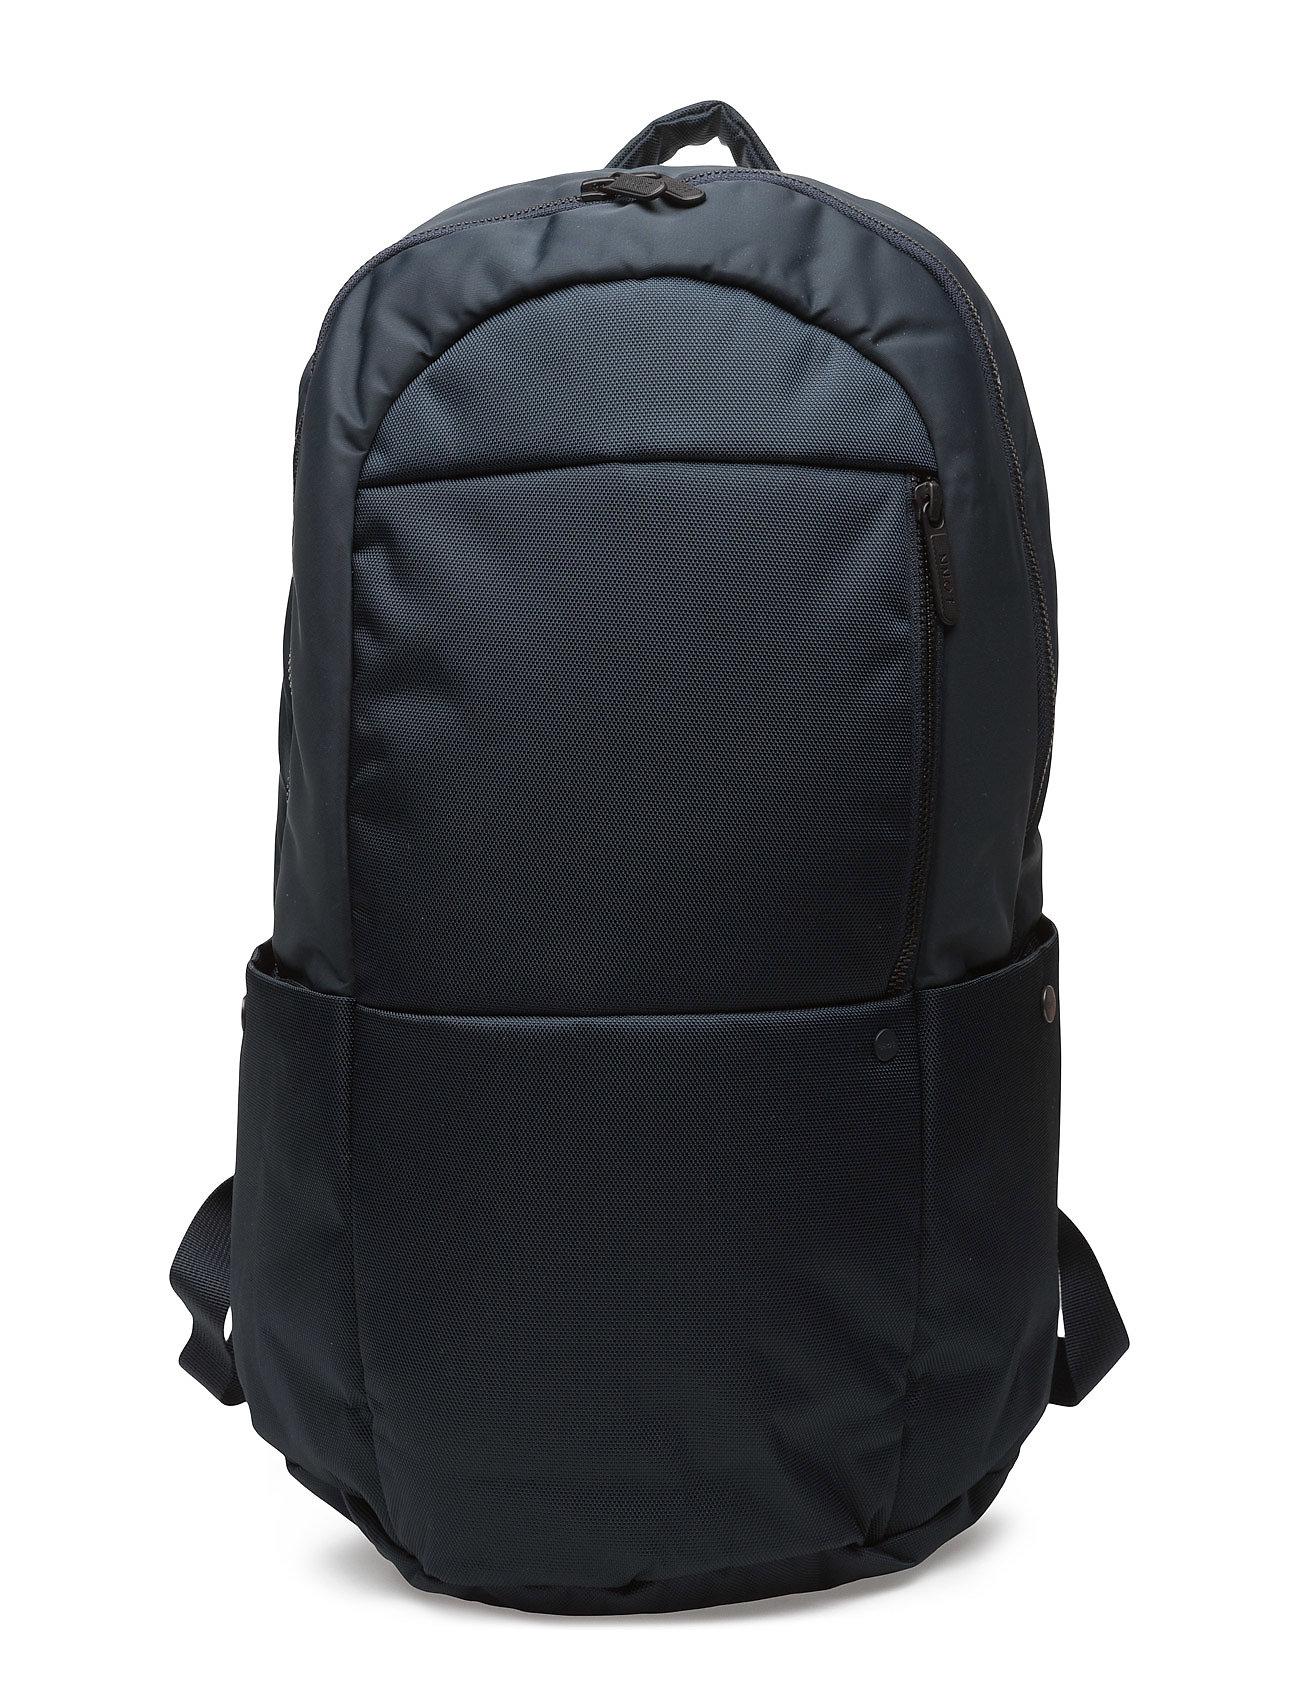 Bild på Backpack 9079